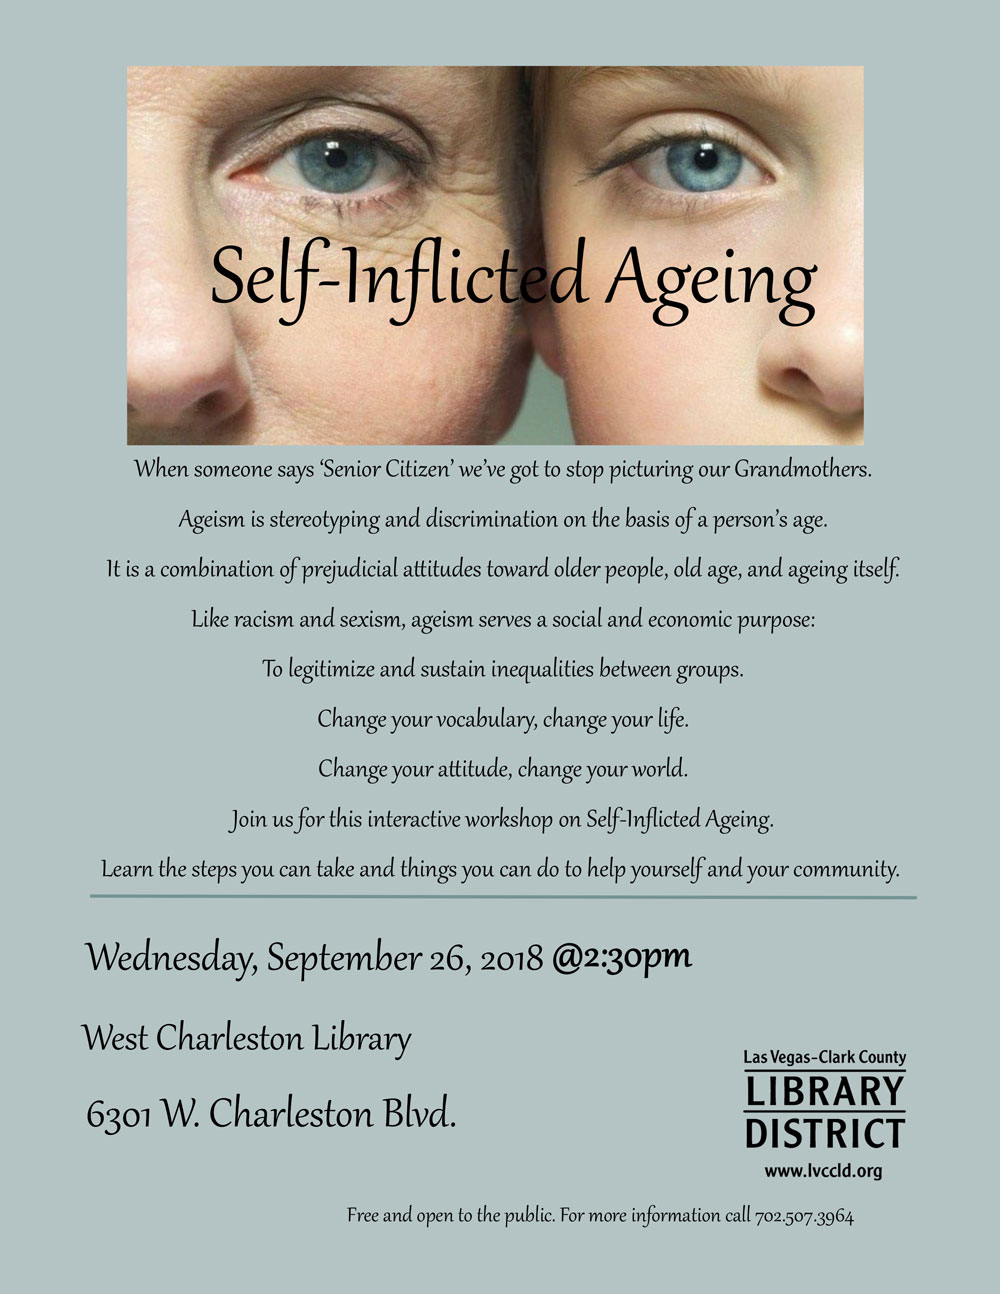 Self-Inflicted-Ageing-09-26-18.jpg